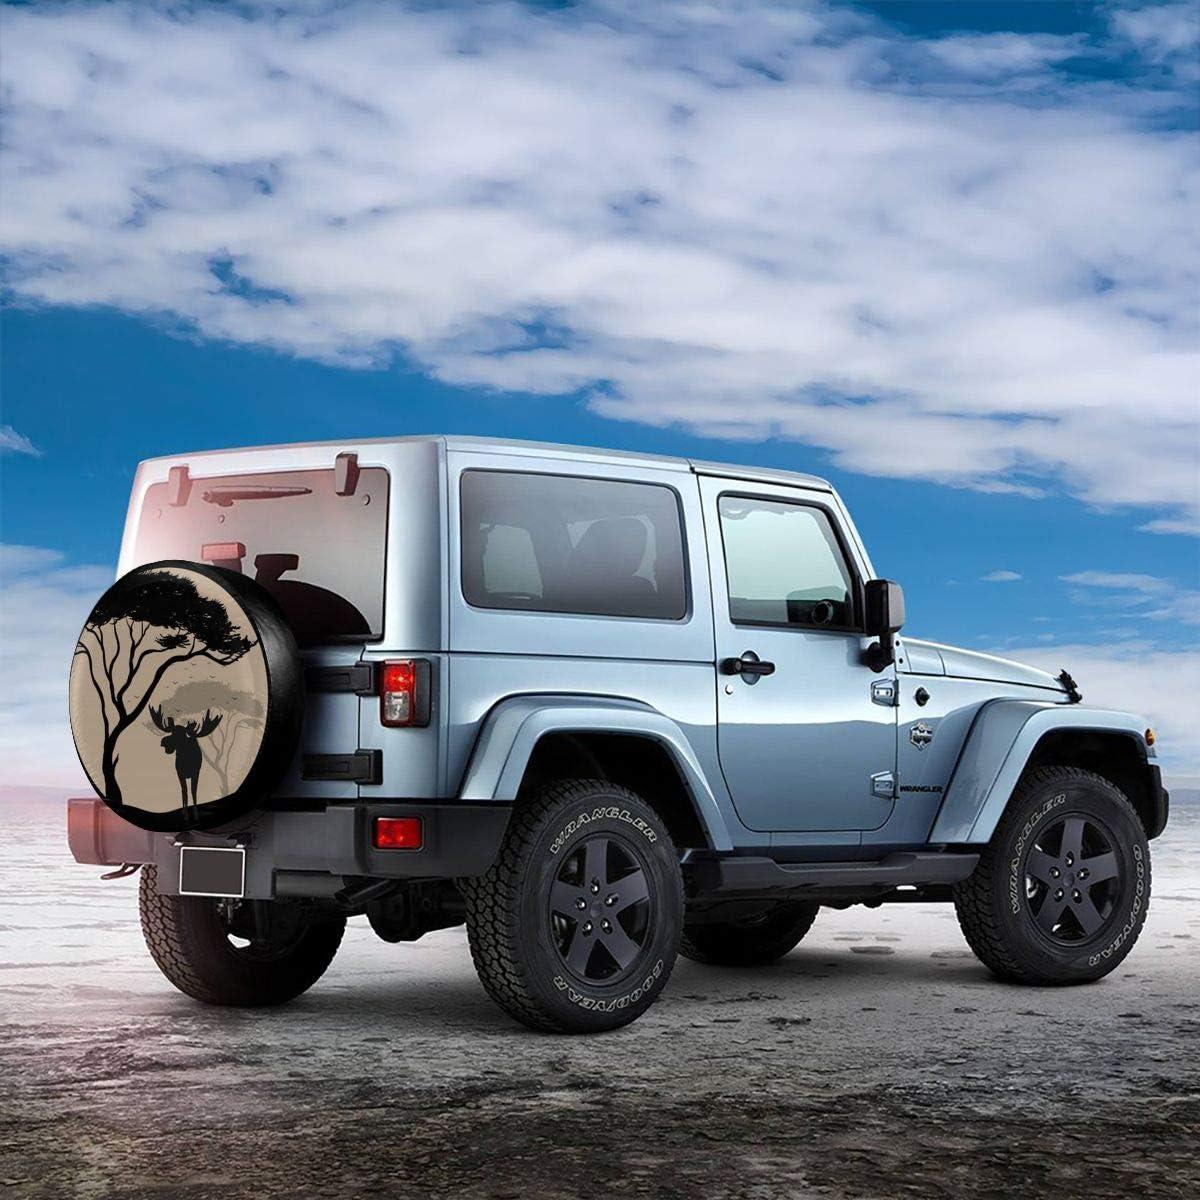 LOKIDVE Happy Camper Spare Tire Cover Wheel Protectors for Jeep Wrangler RV SUV